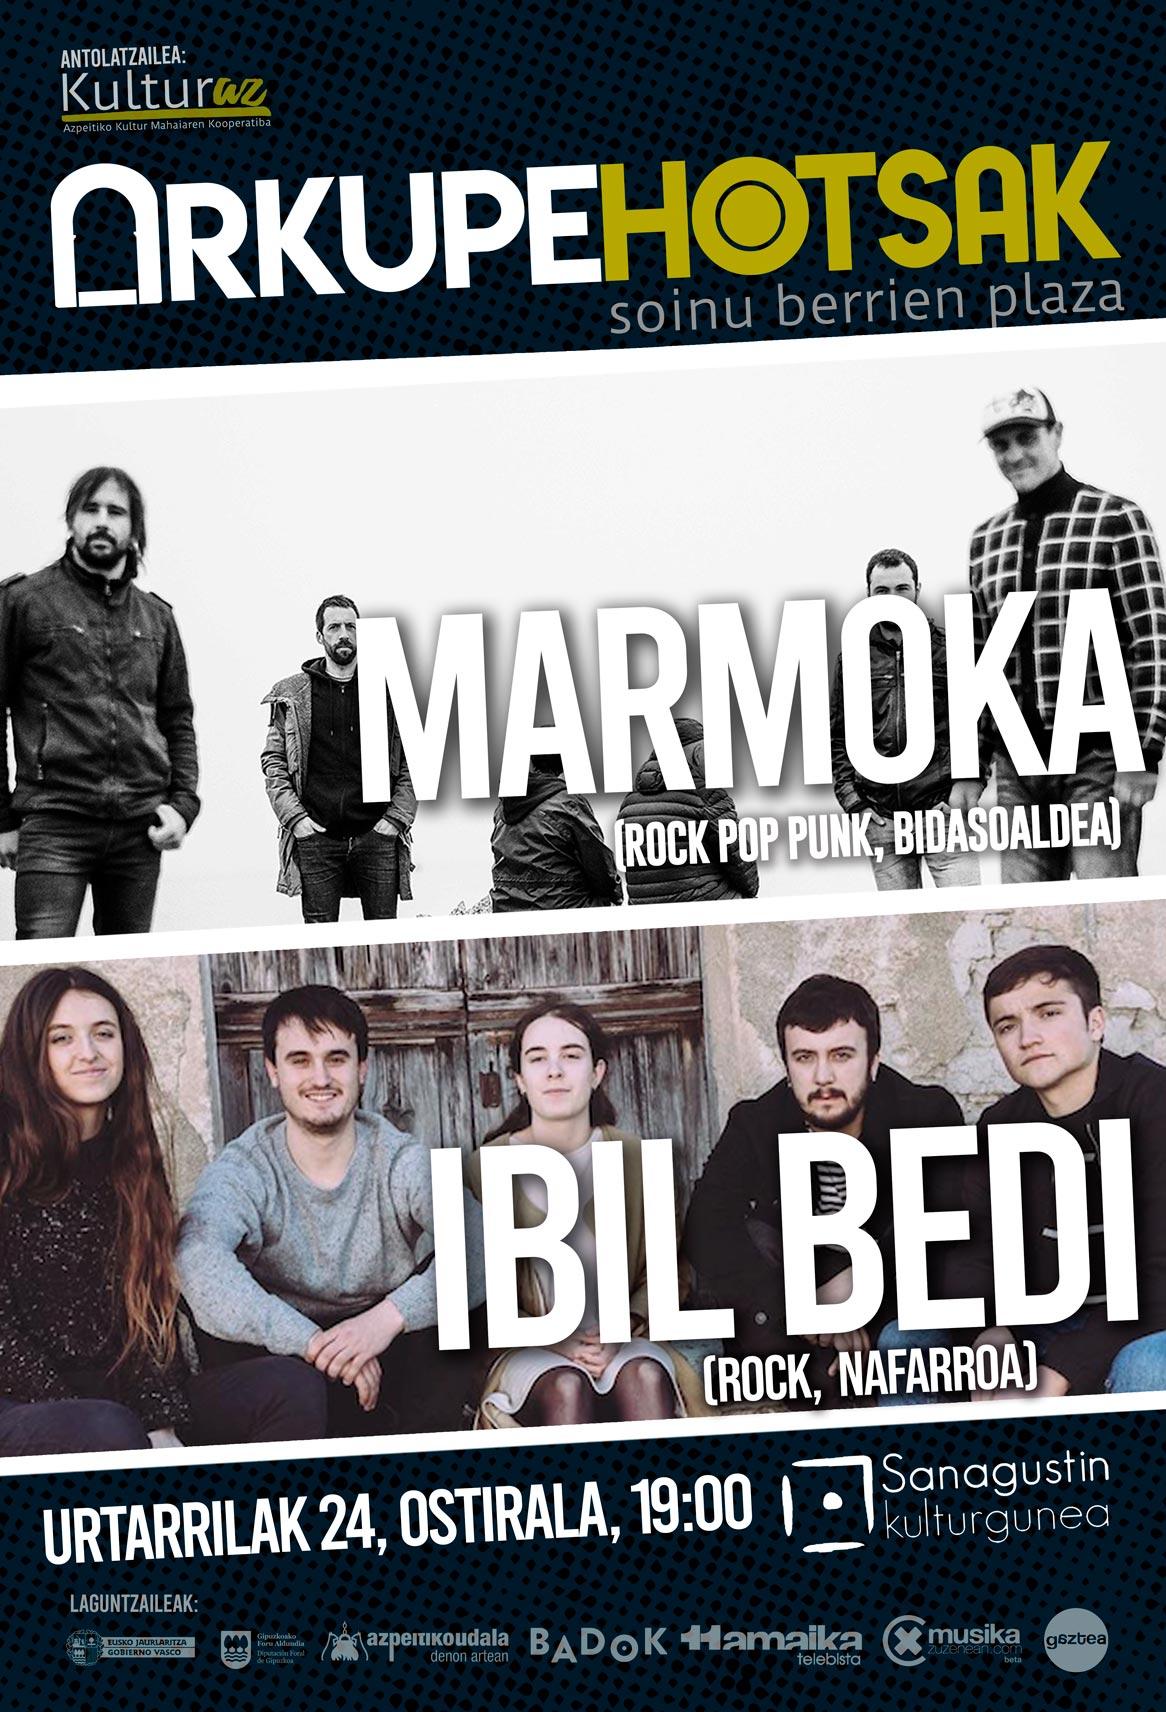 Arkupehotsak: Marmoka + Ibil Bedi